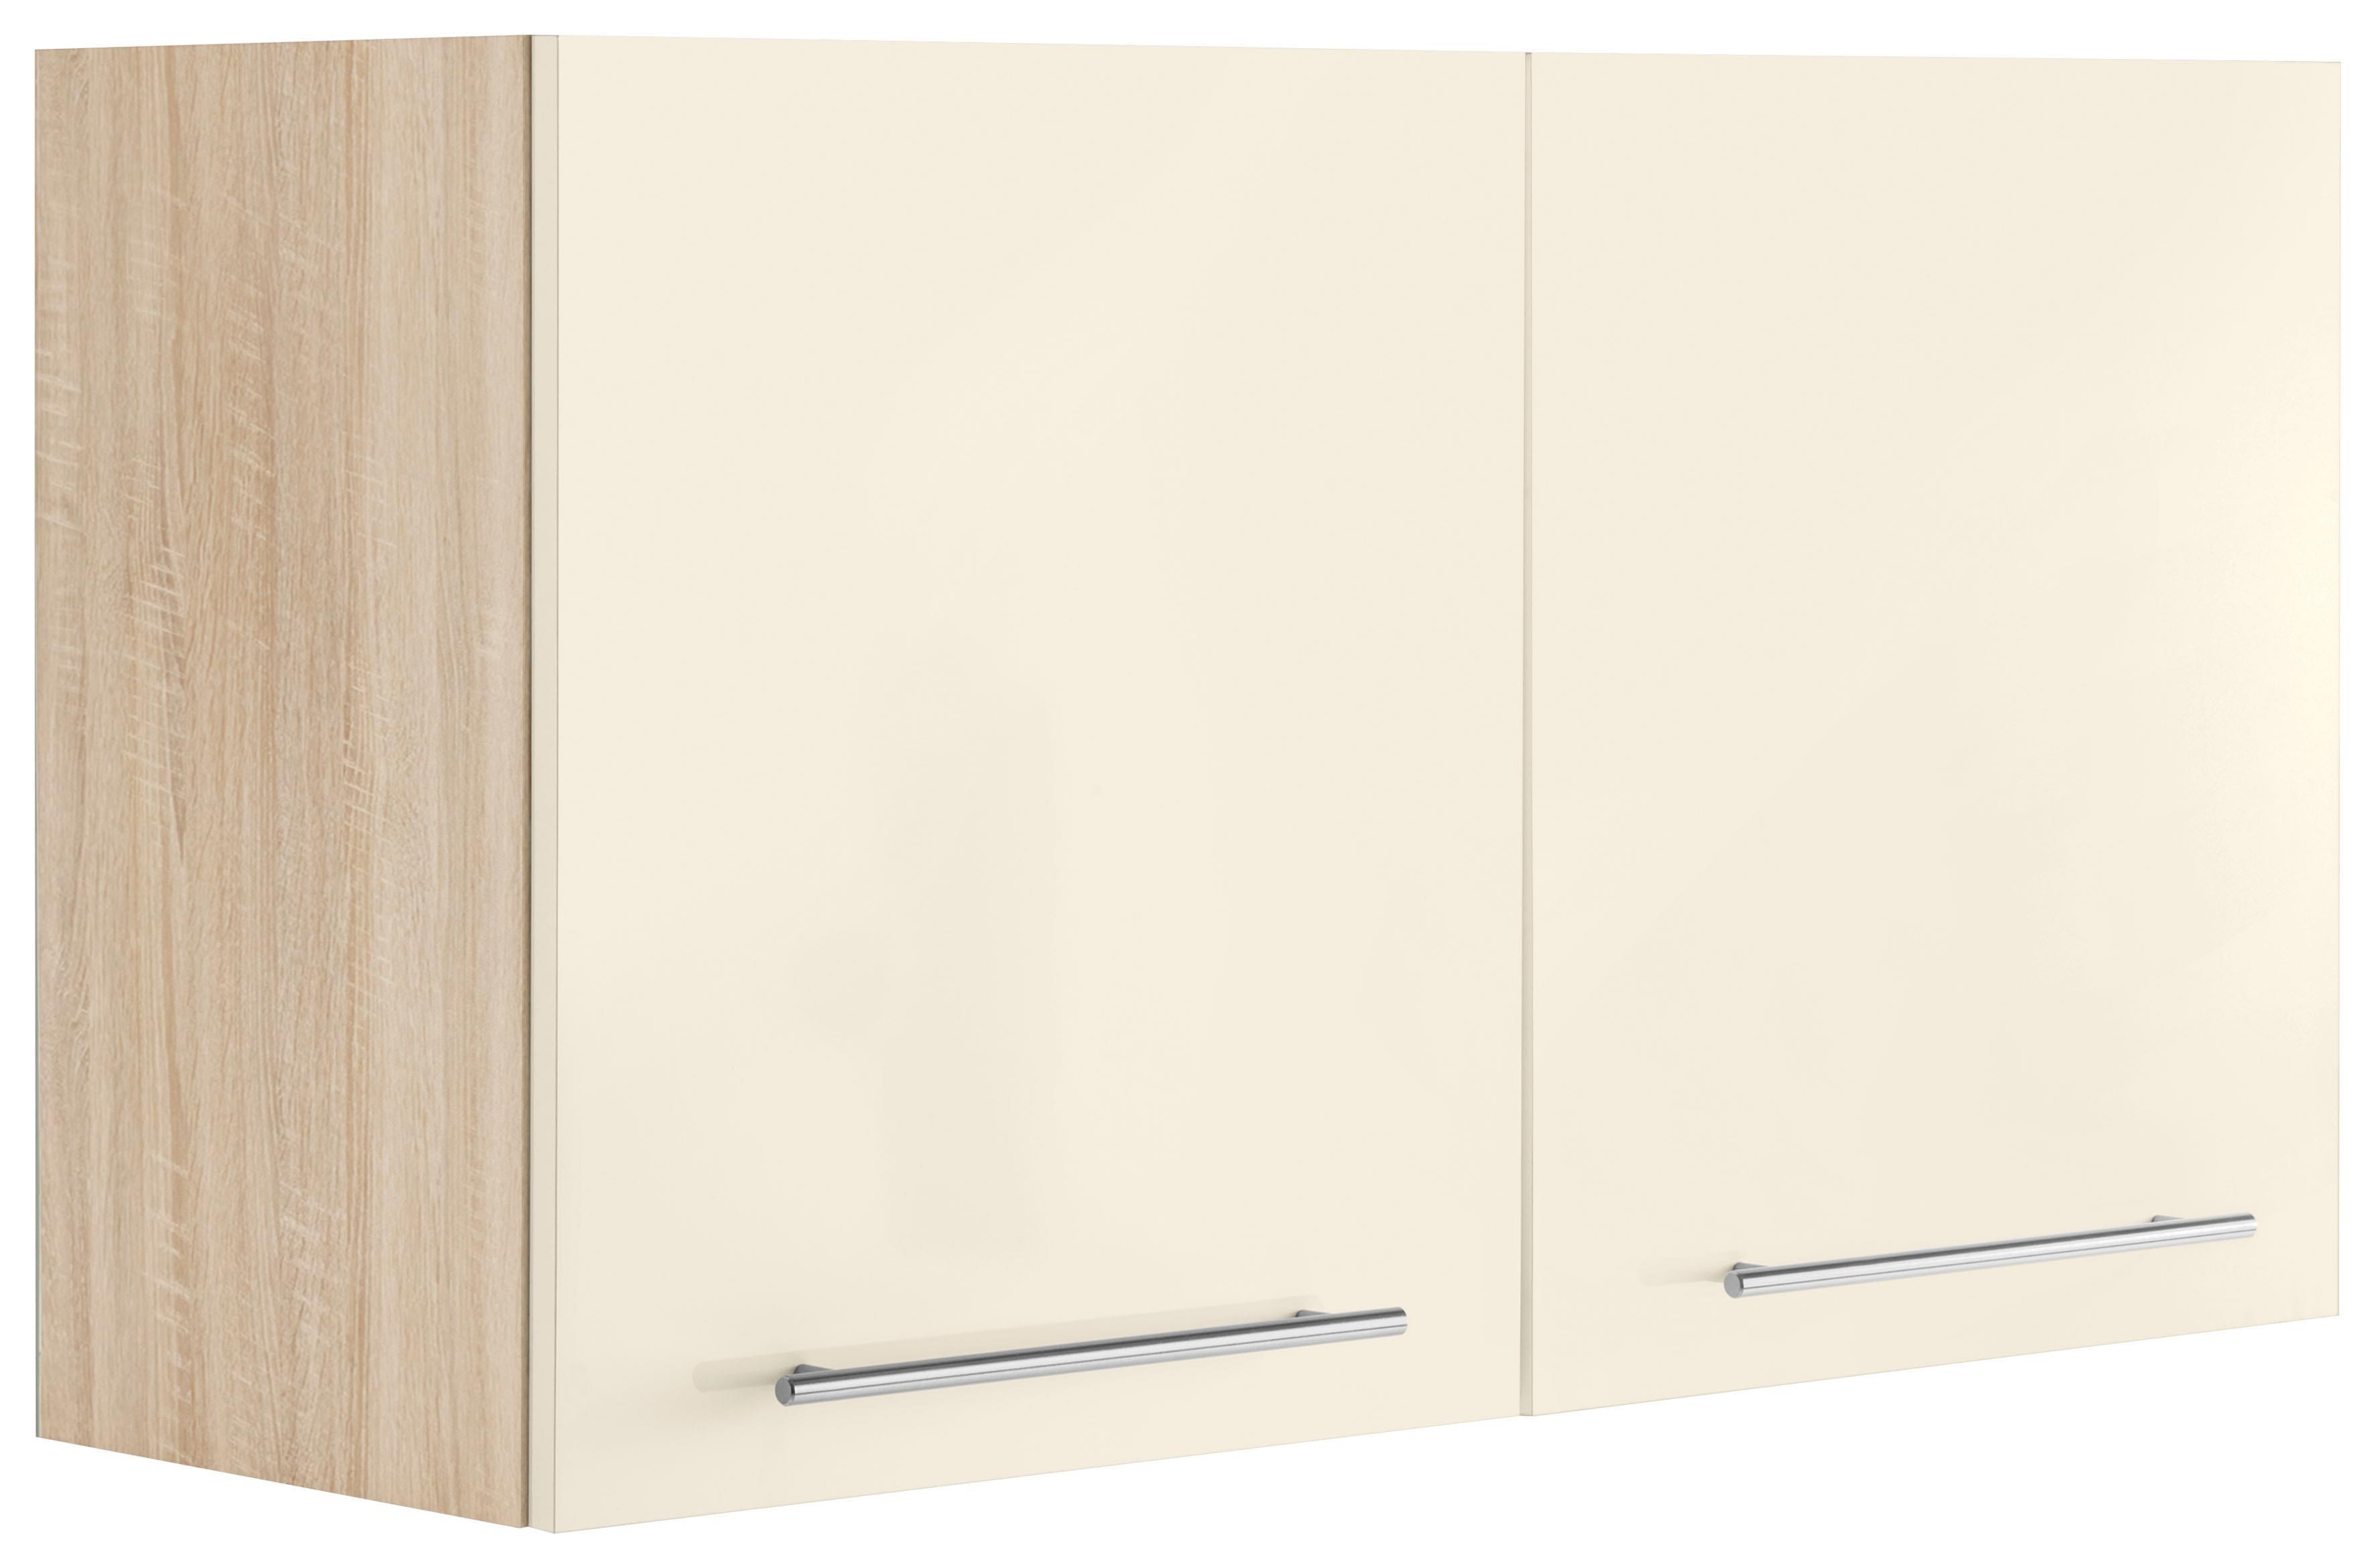 wiho k chen h ngeschrank flexi2 breite 100 cm auf. Black Bedroom Furniture Sets. Home Design Ideas